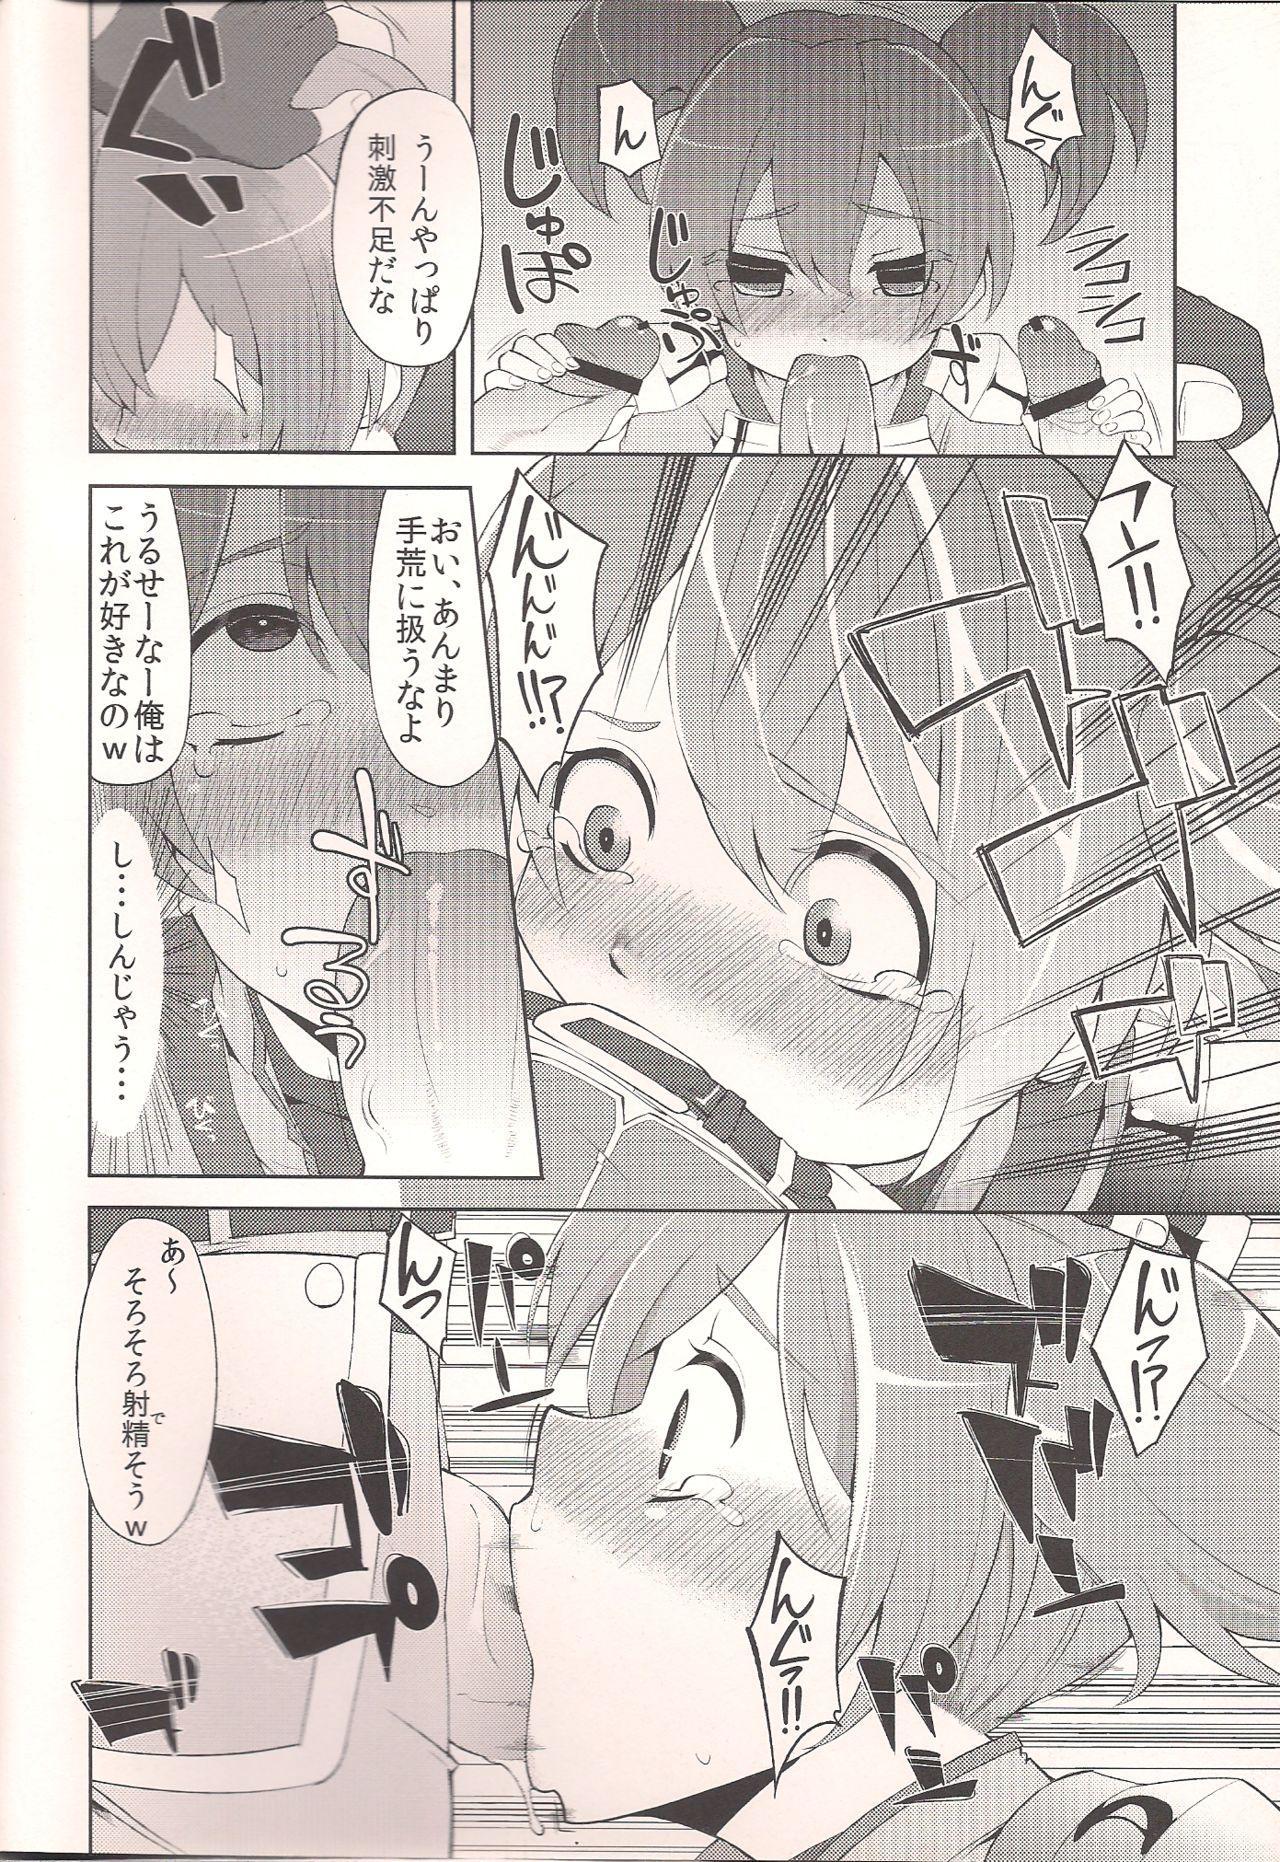 (C83) [Shouwa Saishuu Sensen (Hanauna)] Silica-tan Bibouroku. - My Sweet Silica Memorandum Record (Sword Art Online) 5